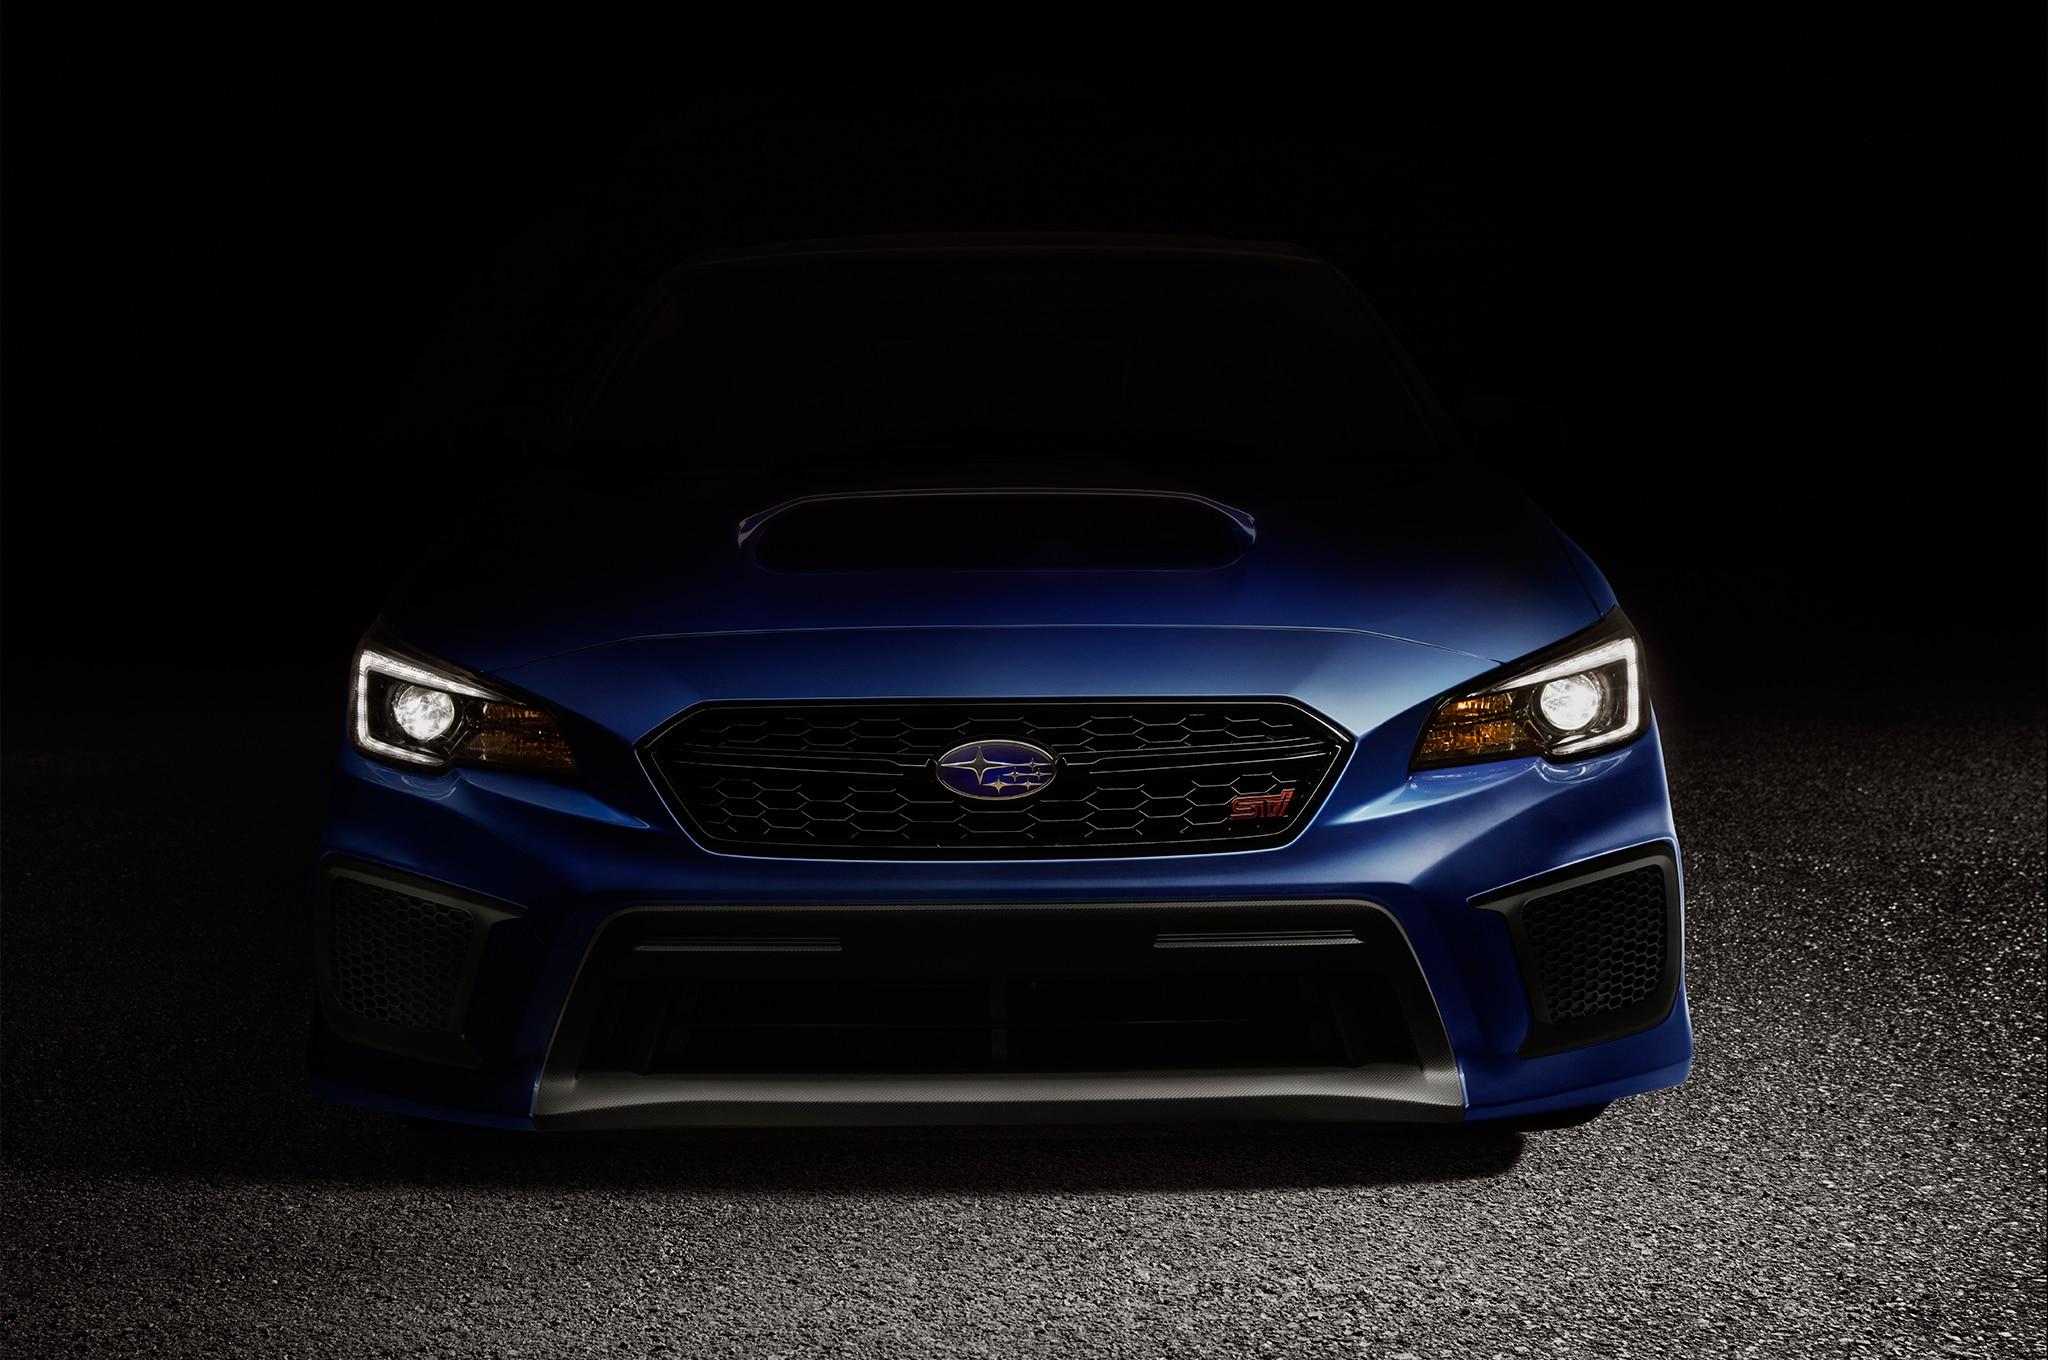 Wrx Cvt >> 2018 Subaru WRX Starts at $27,855 | Automobile Magazine